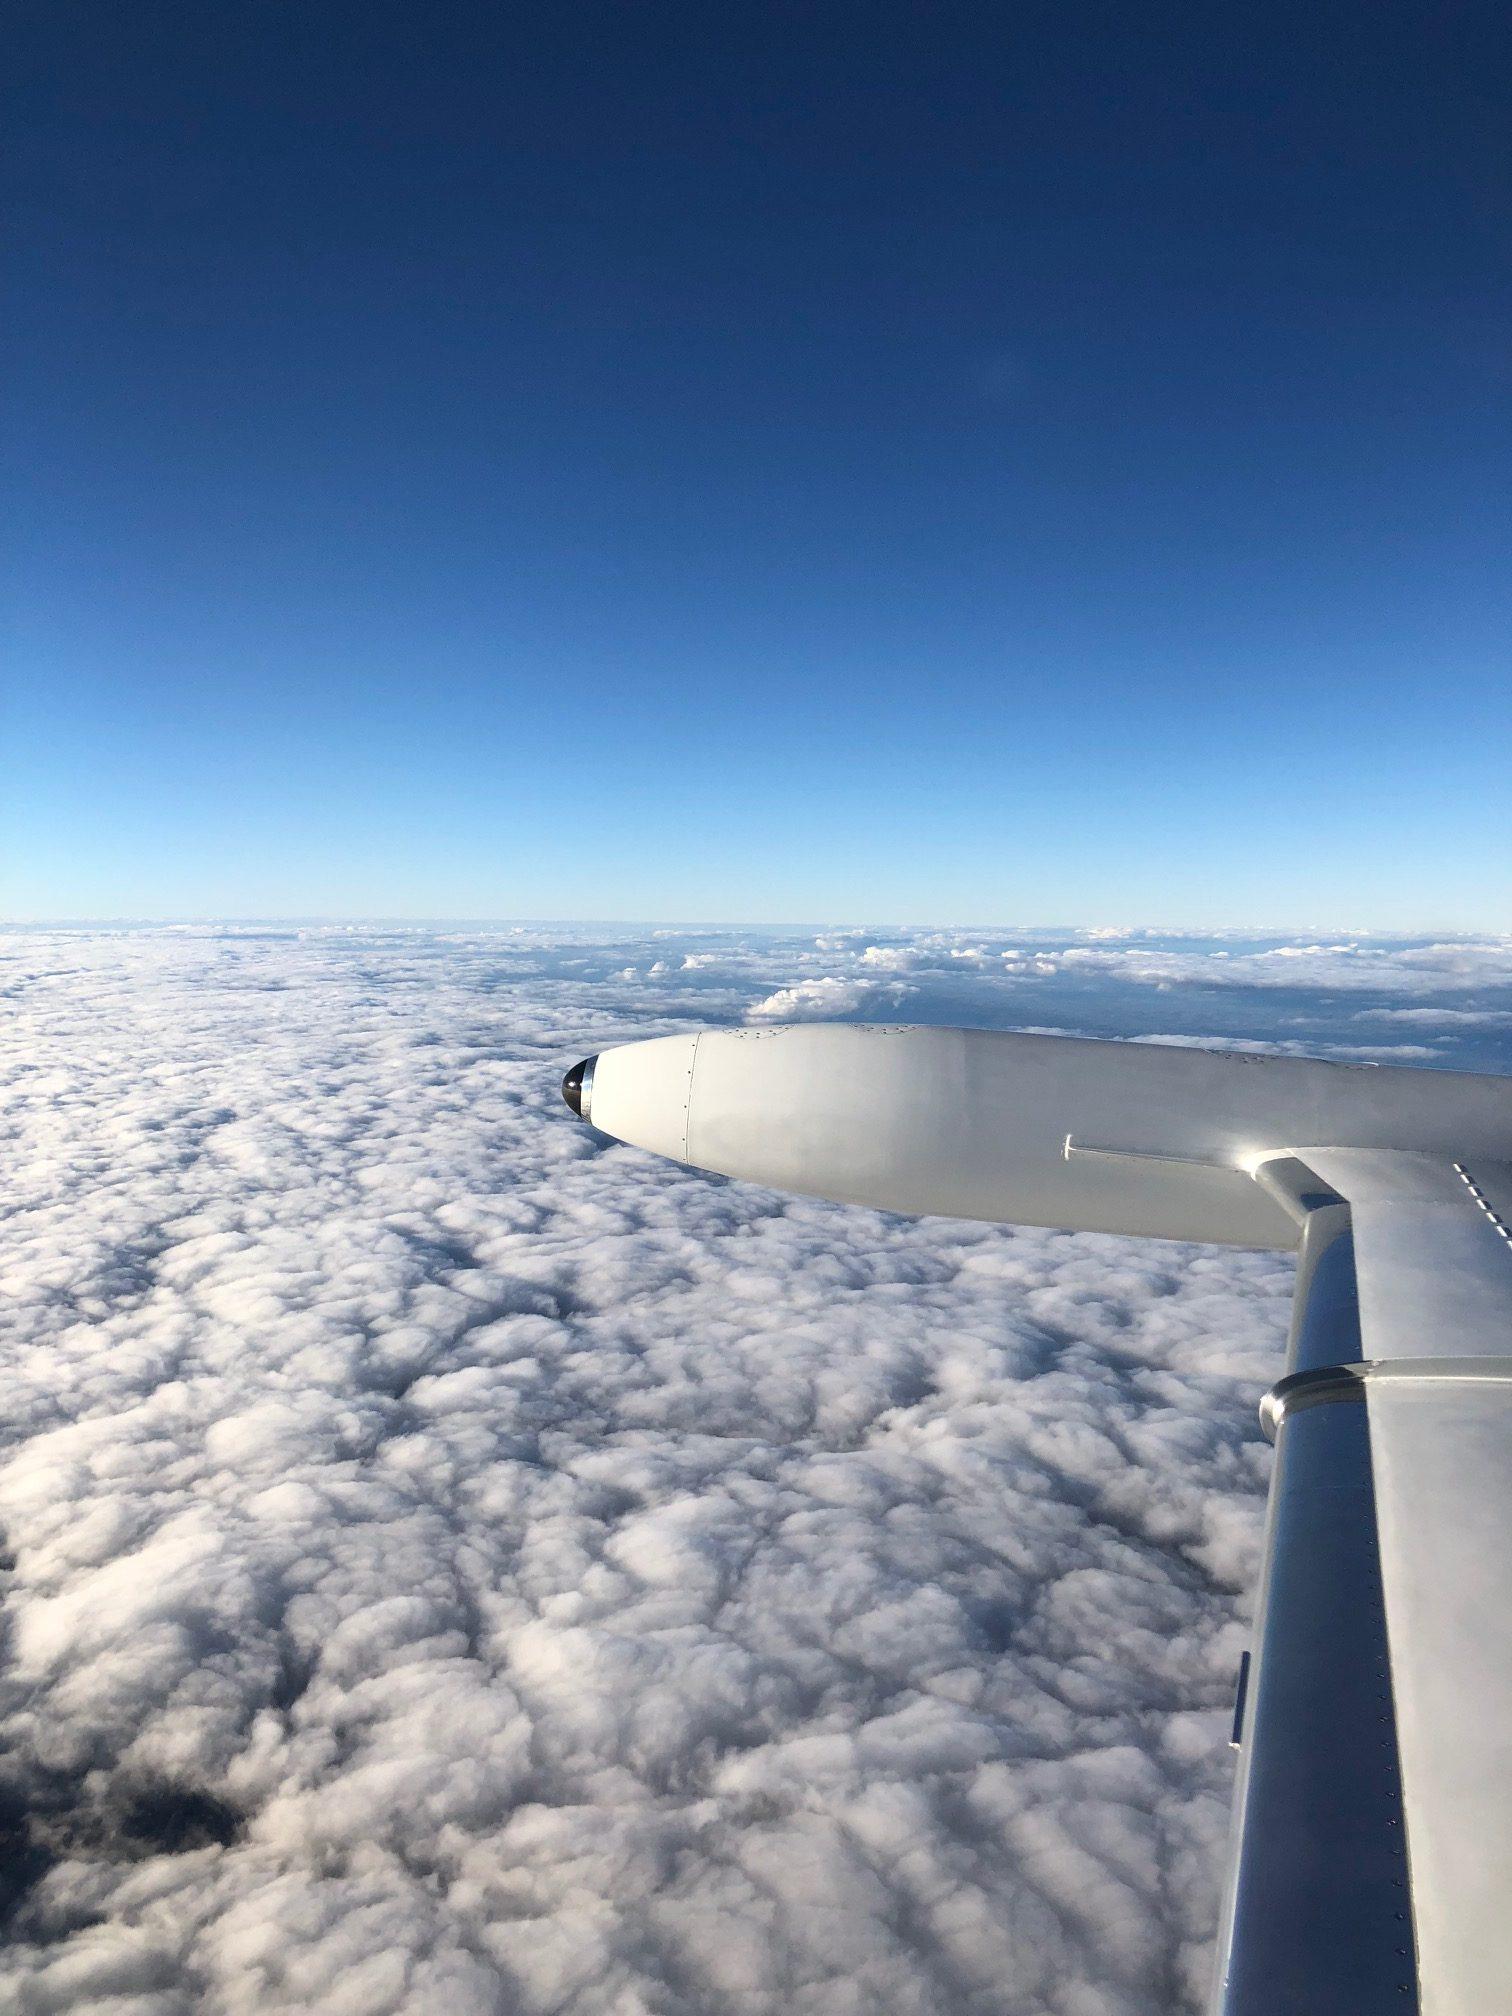 UTI Aérea Belo Horizonte